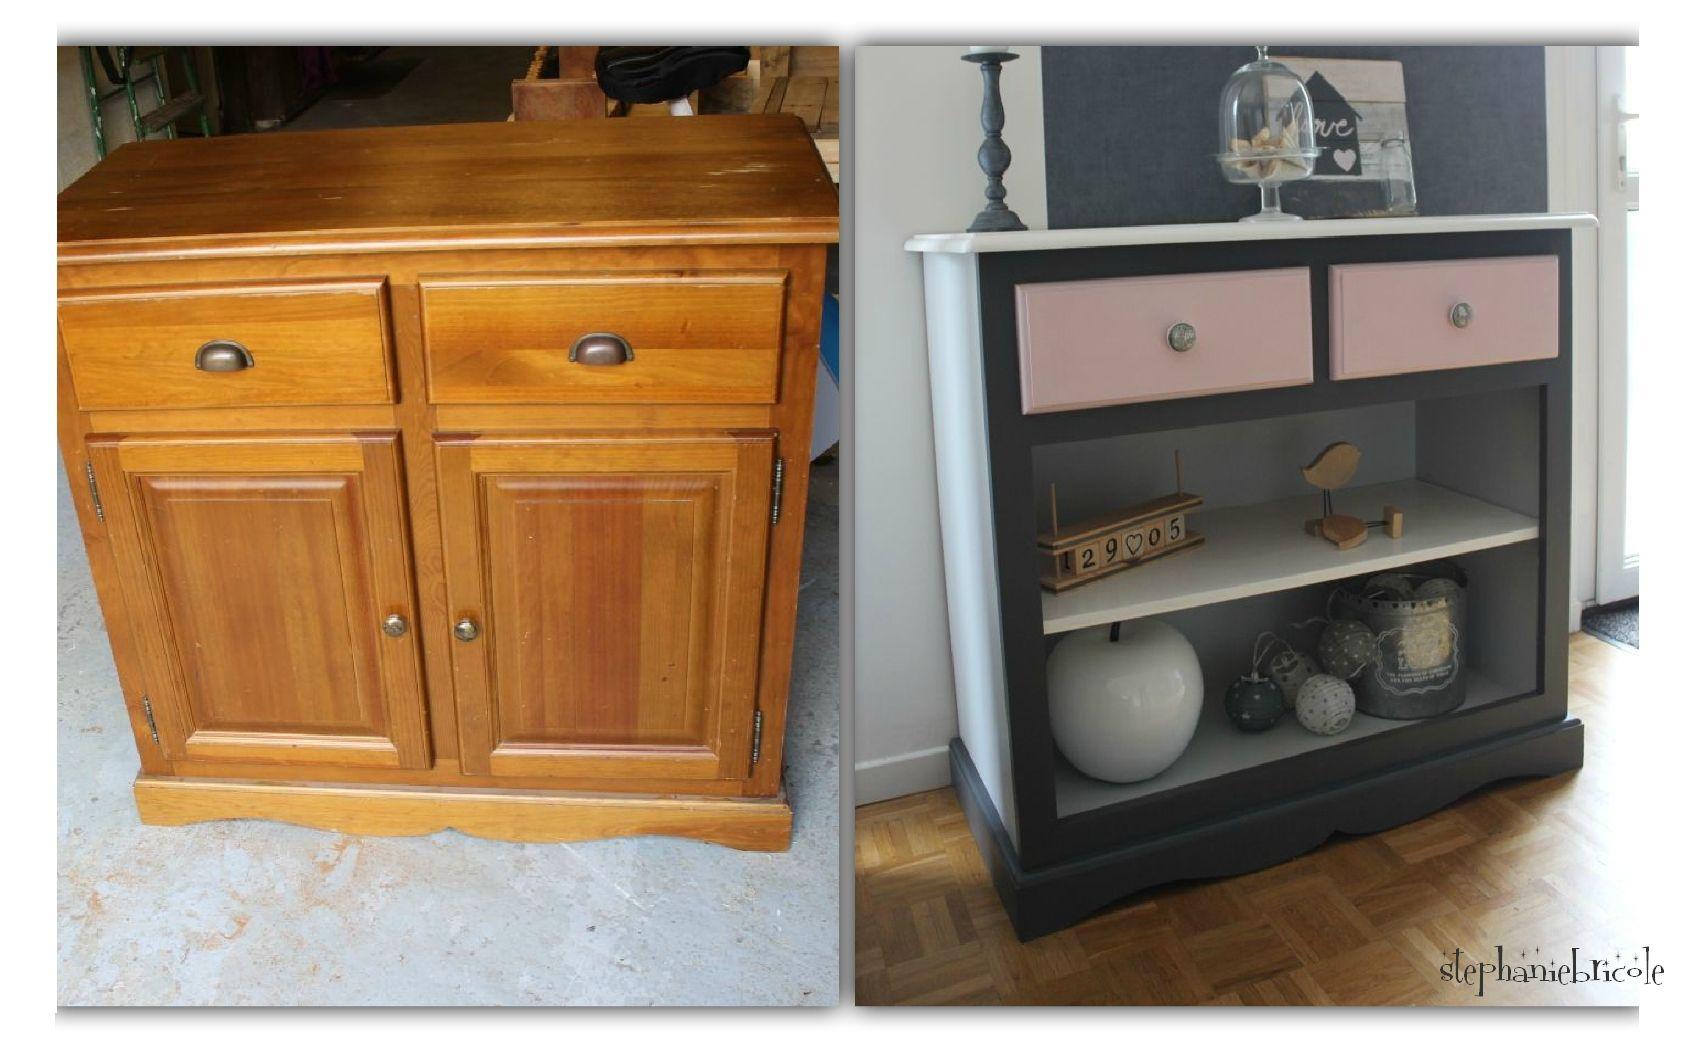 diy récup : idée relooking/transformation de meubles | idée